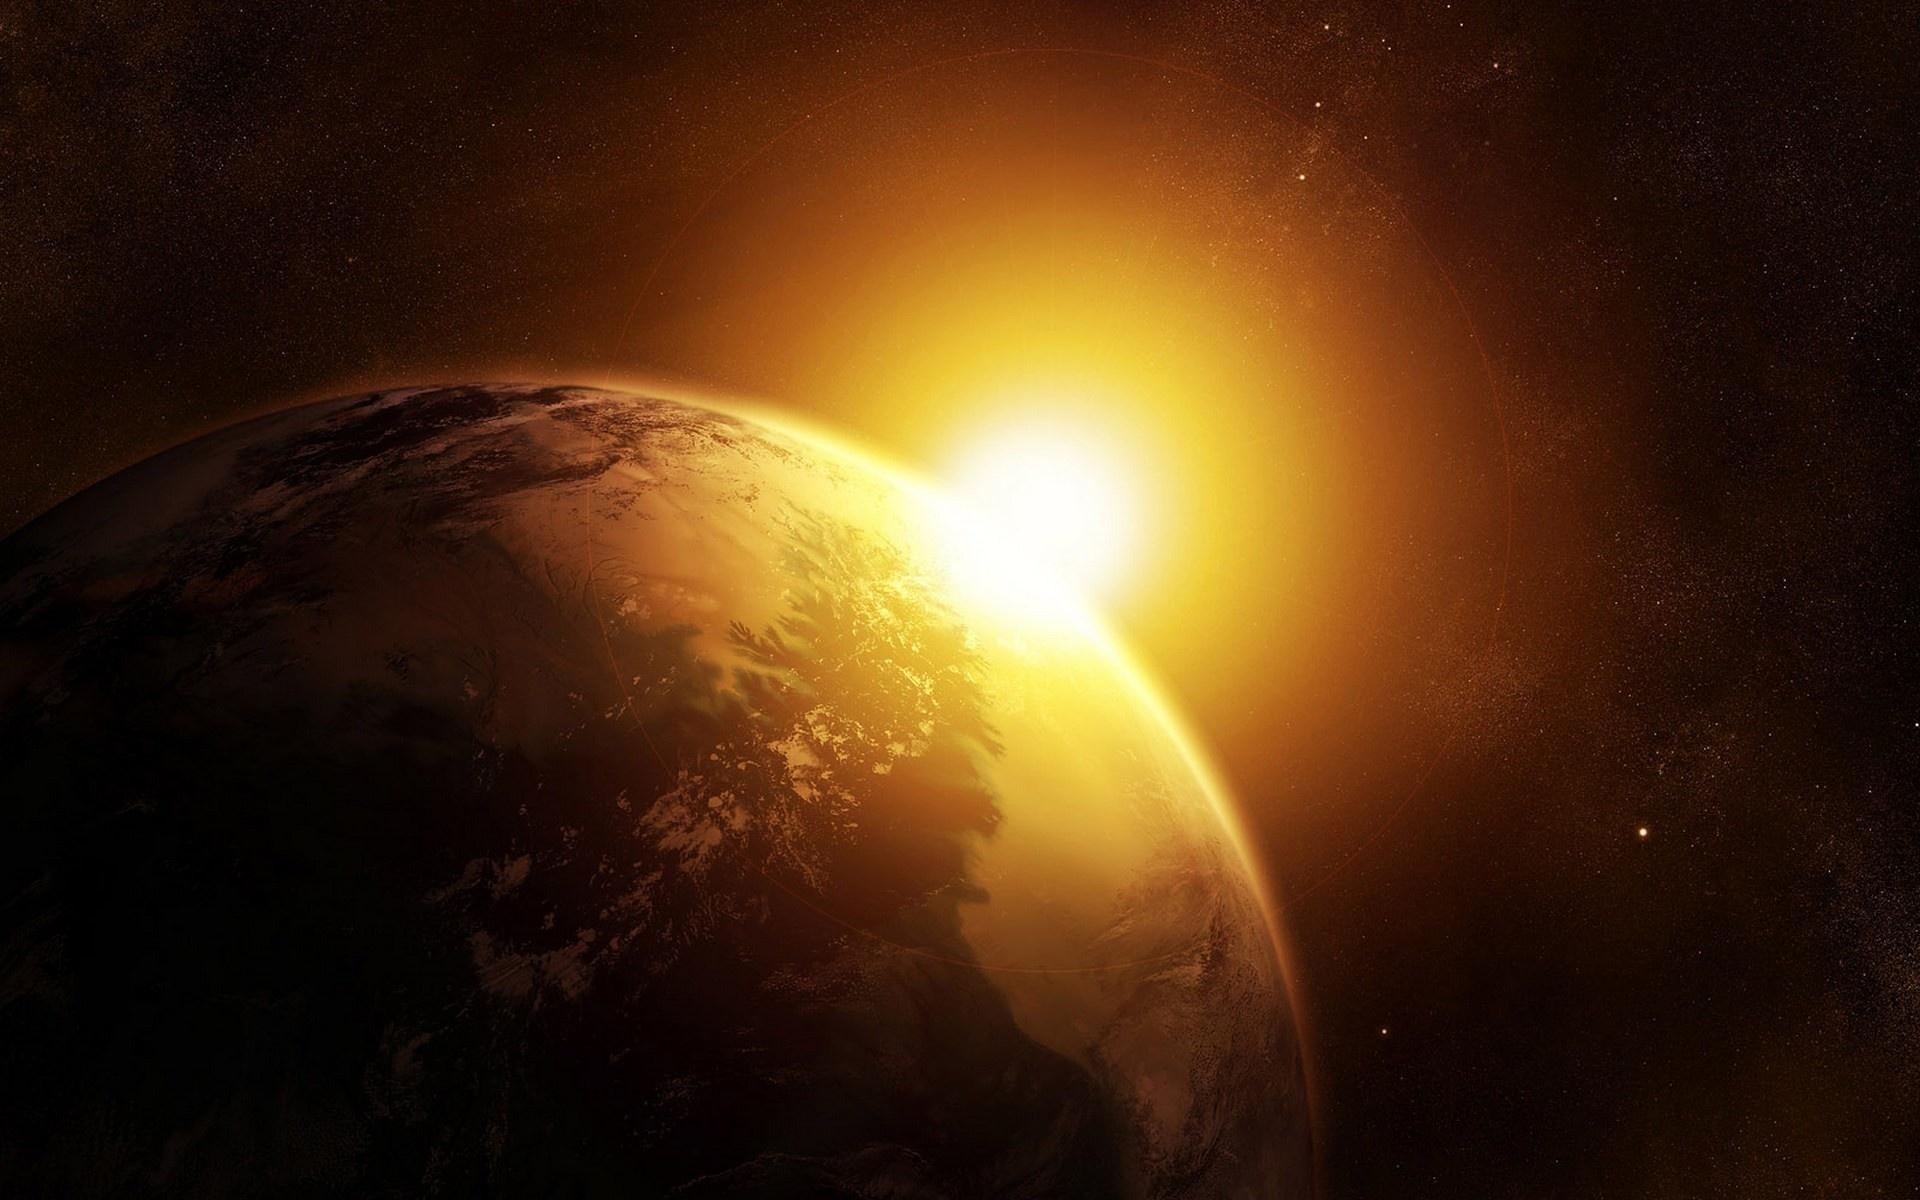 planet-earth-sun-stars-universe